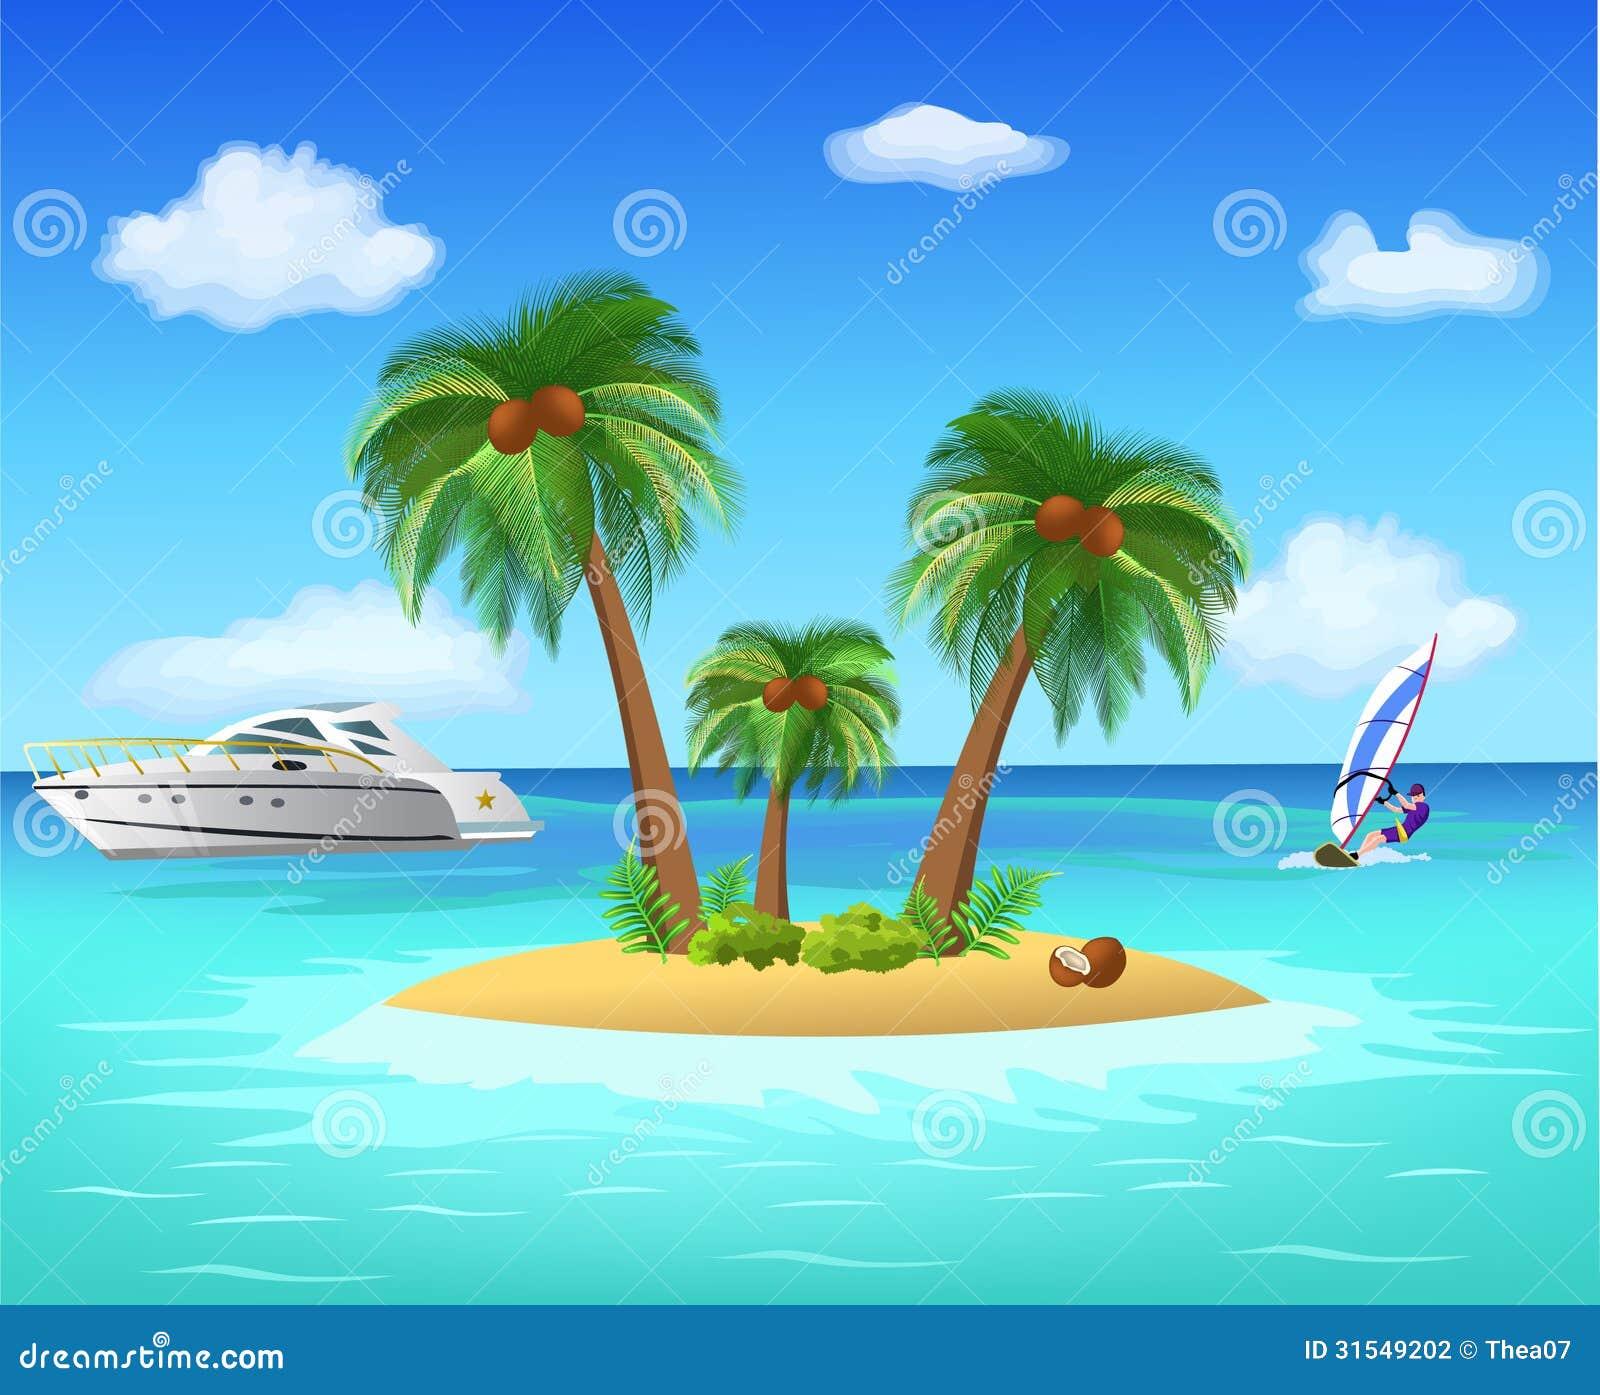 Tropical Island Stock Vector Illustration Of Design